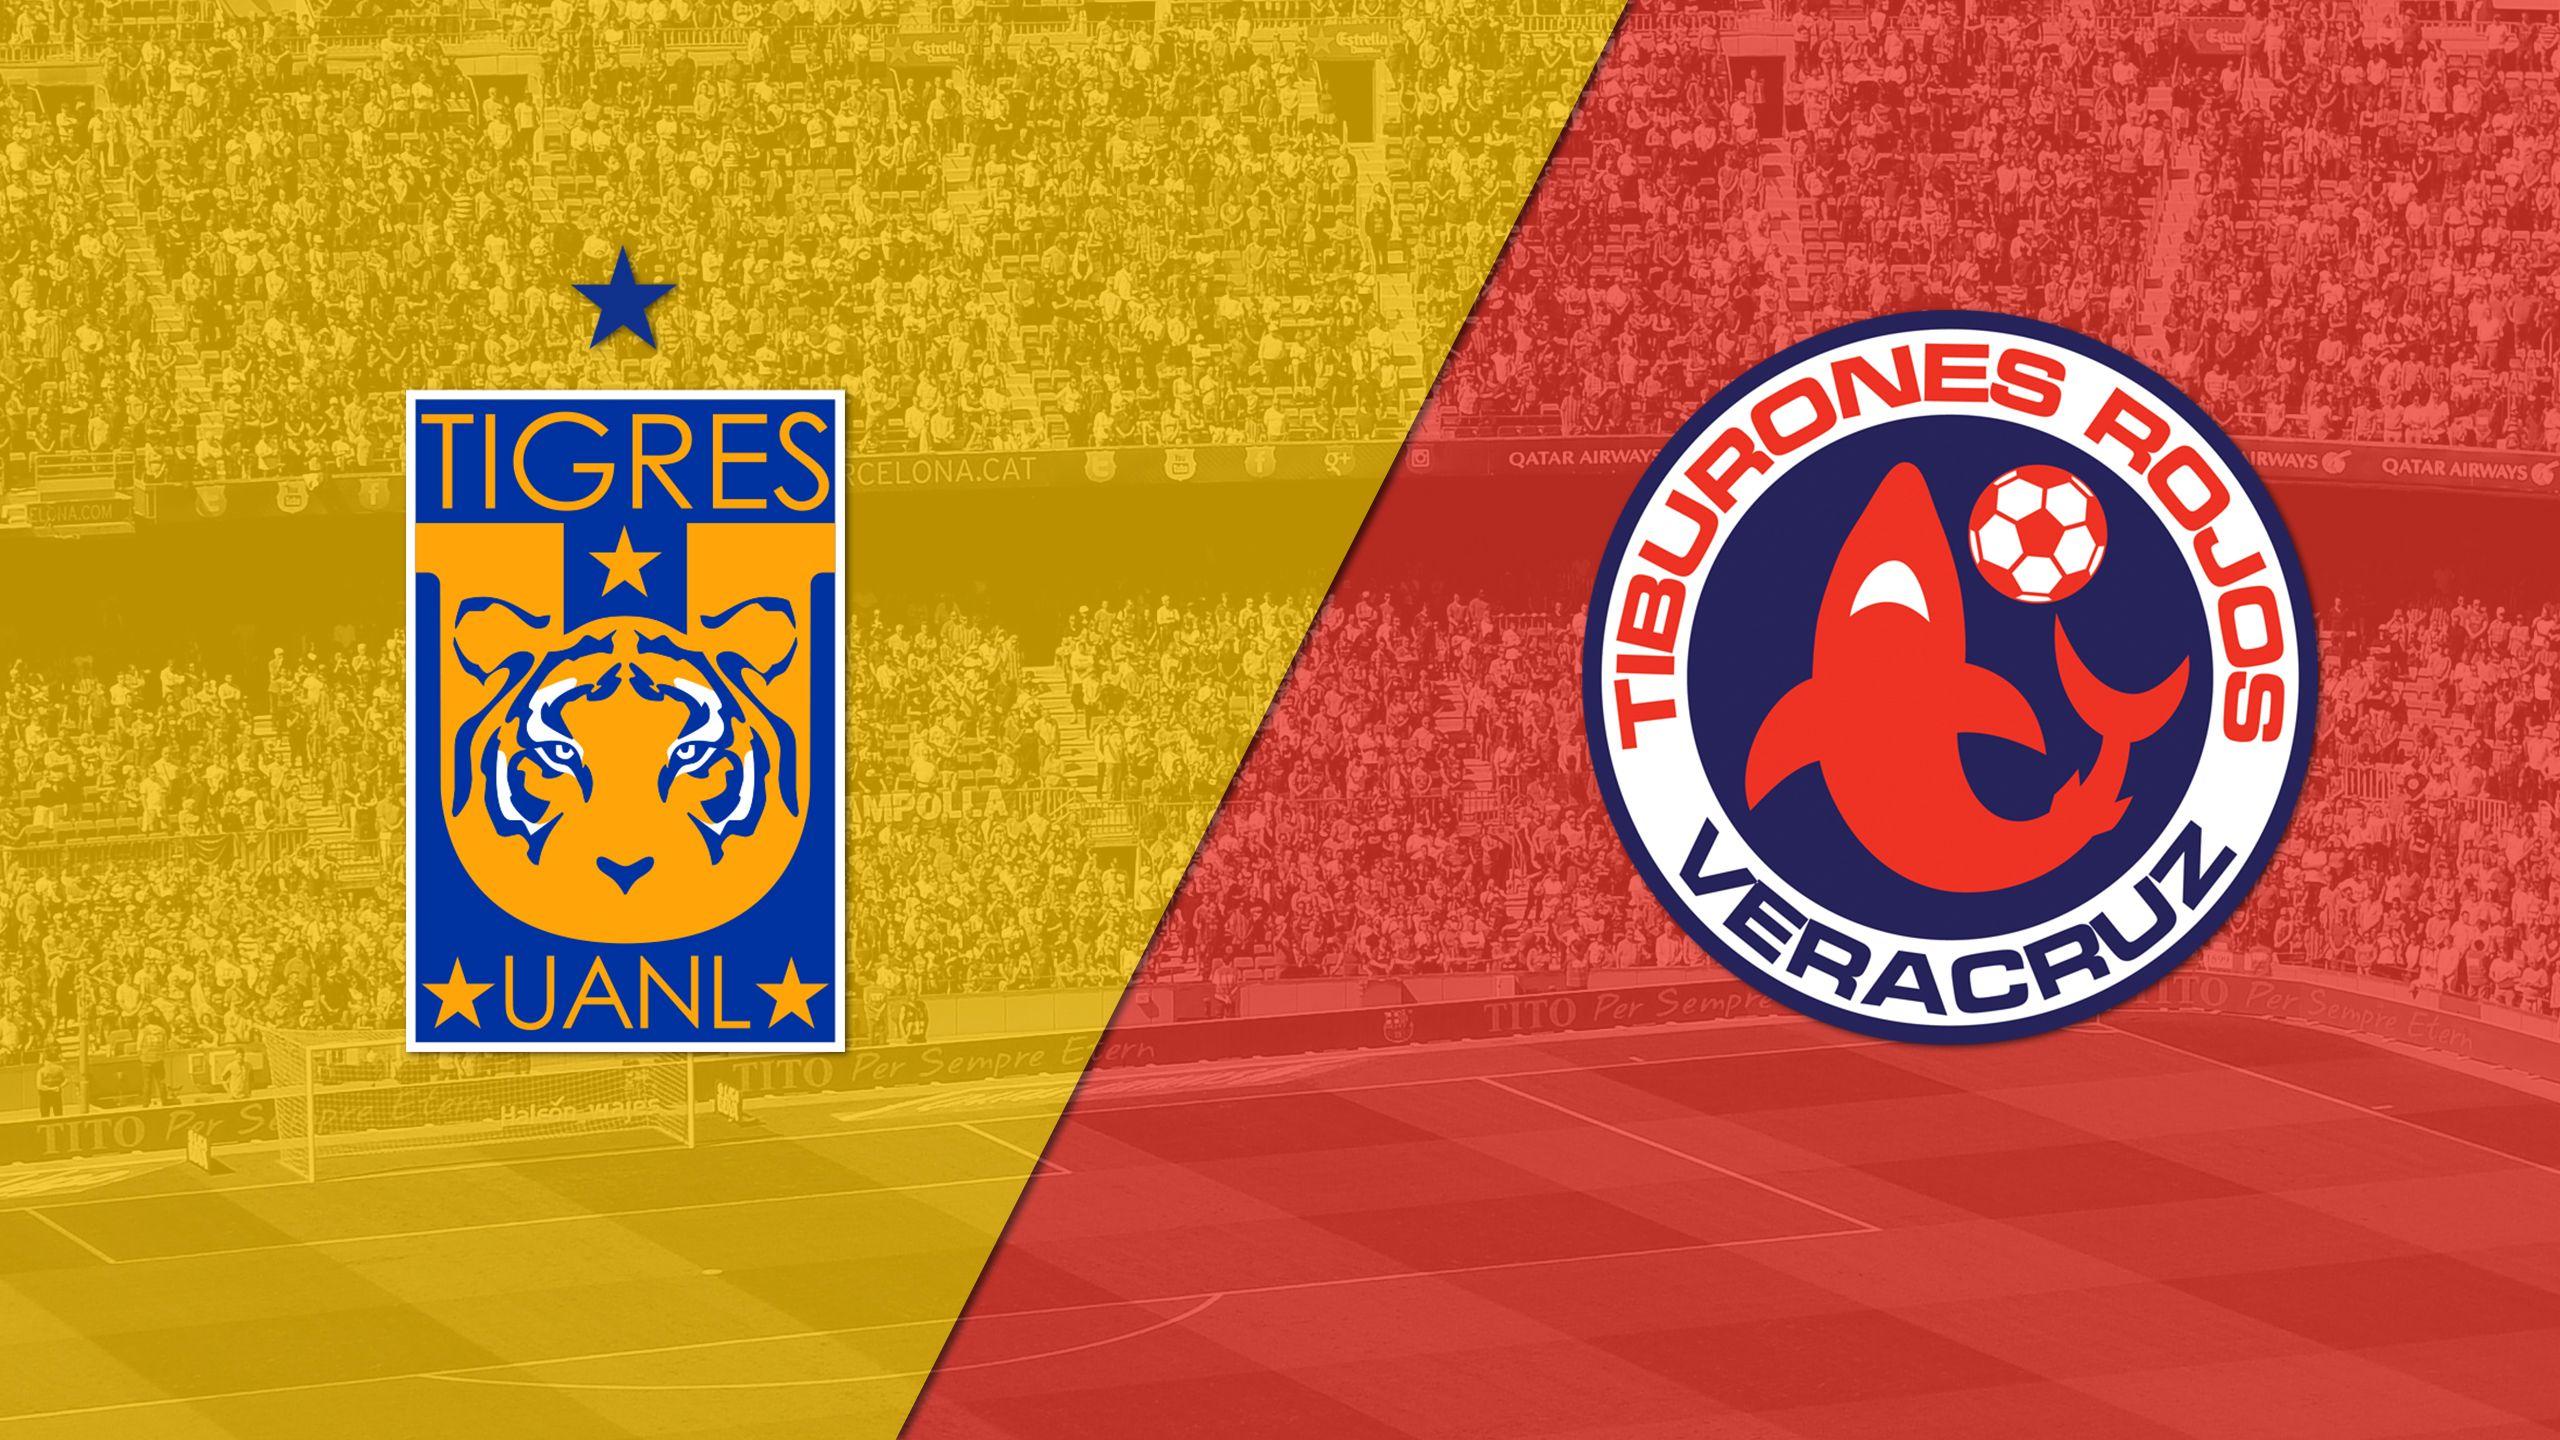 In Spanish - Tigres UANL vs. Tiburones Rojos de Veracruz (Matchday #10) (Liga MX)